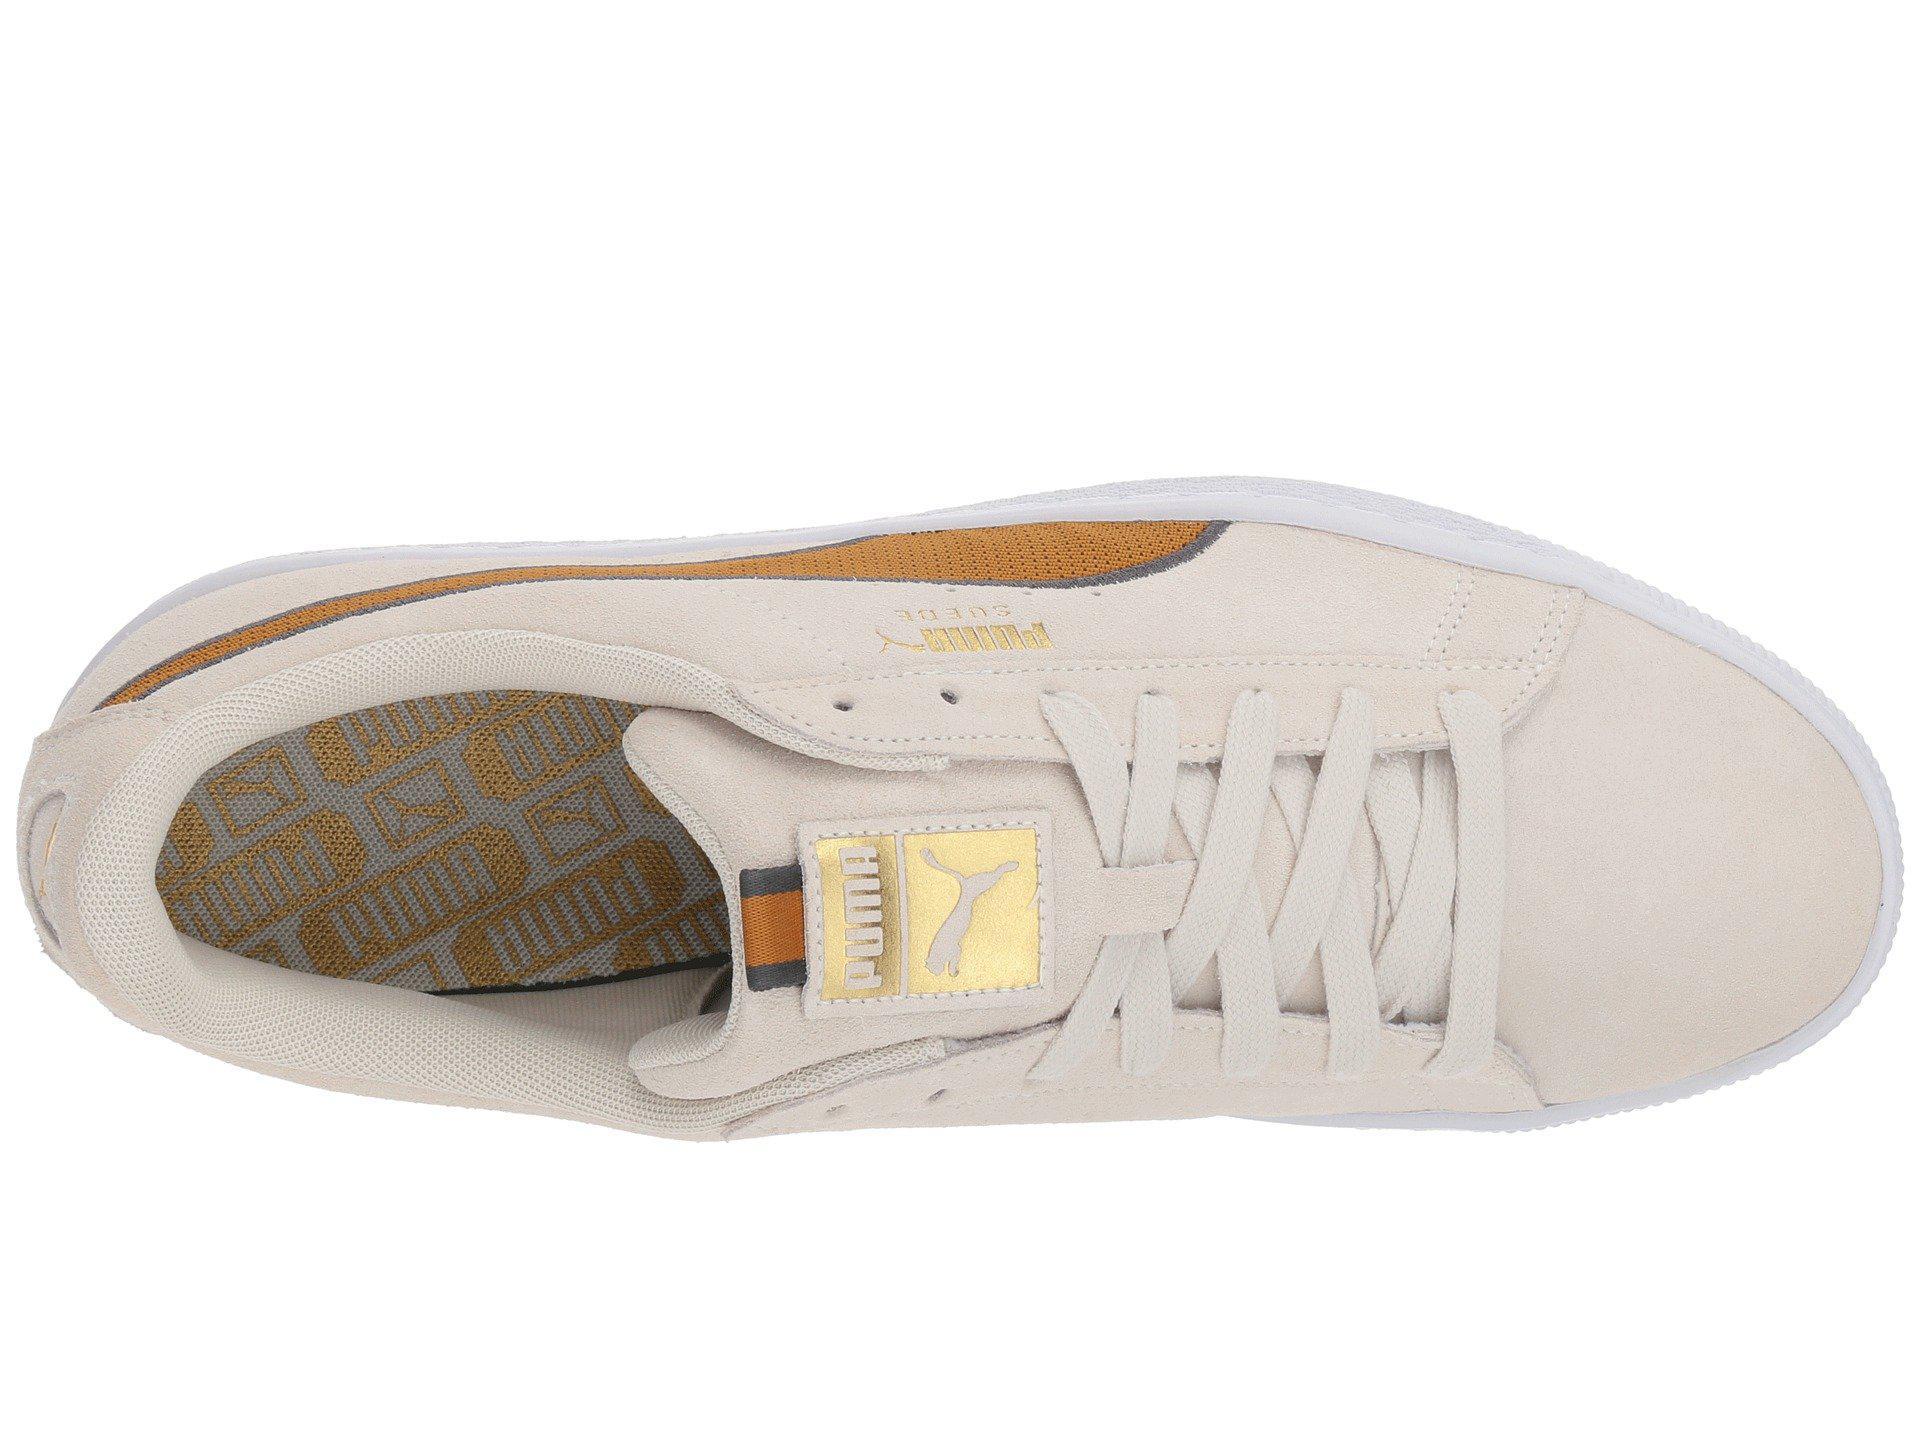 Suede vaporous Gate Grayiron Stripes Classic Lyst Puma Sport